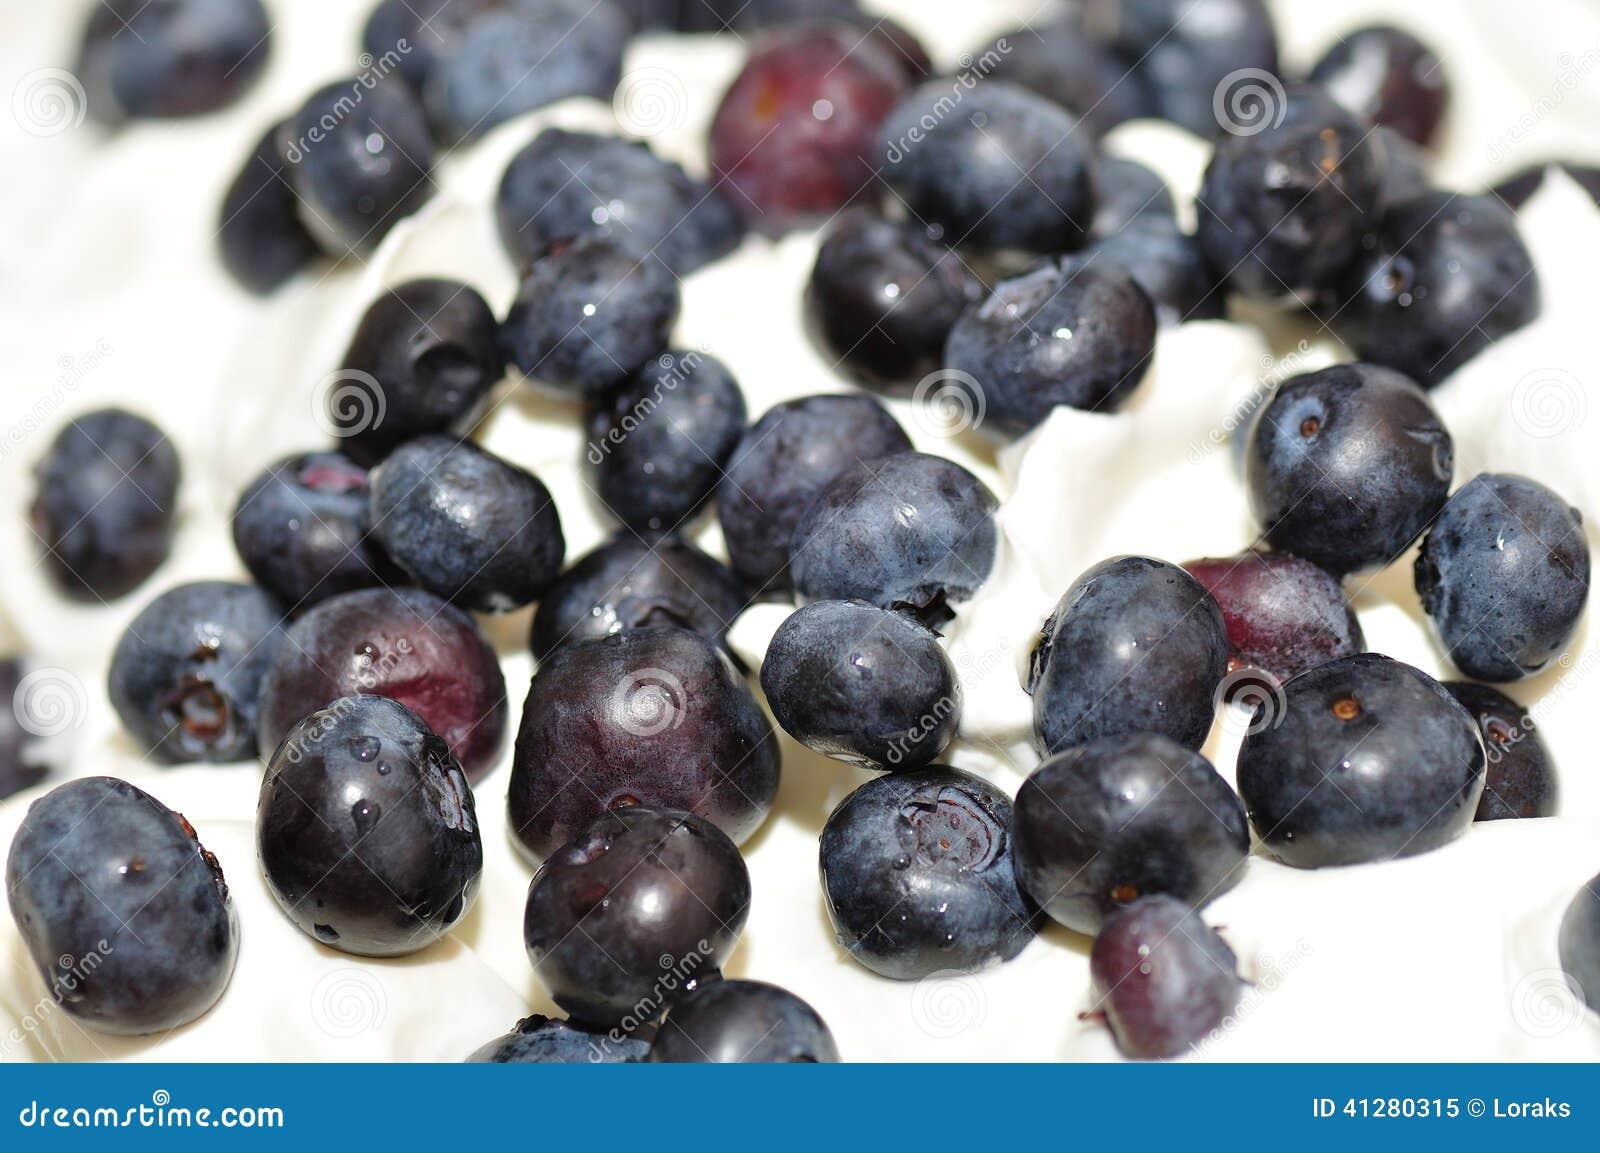 ... and sweet cream sweet cream blackberry blackberries with sweet cream